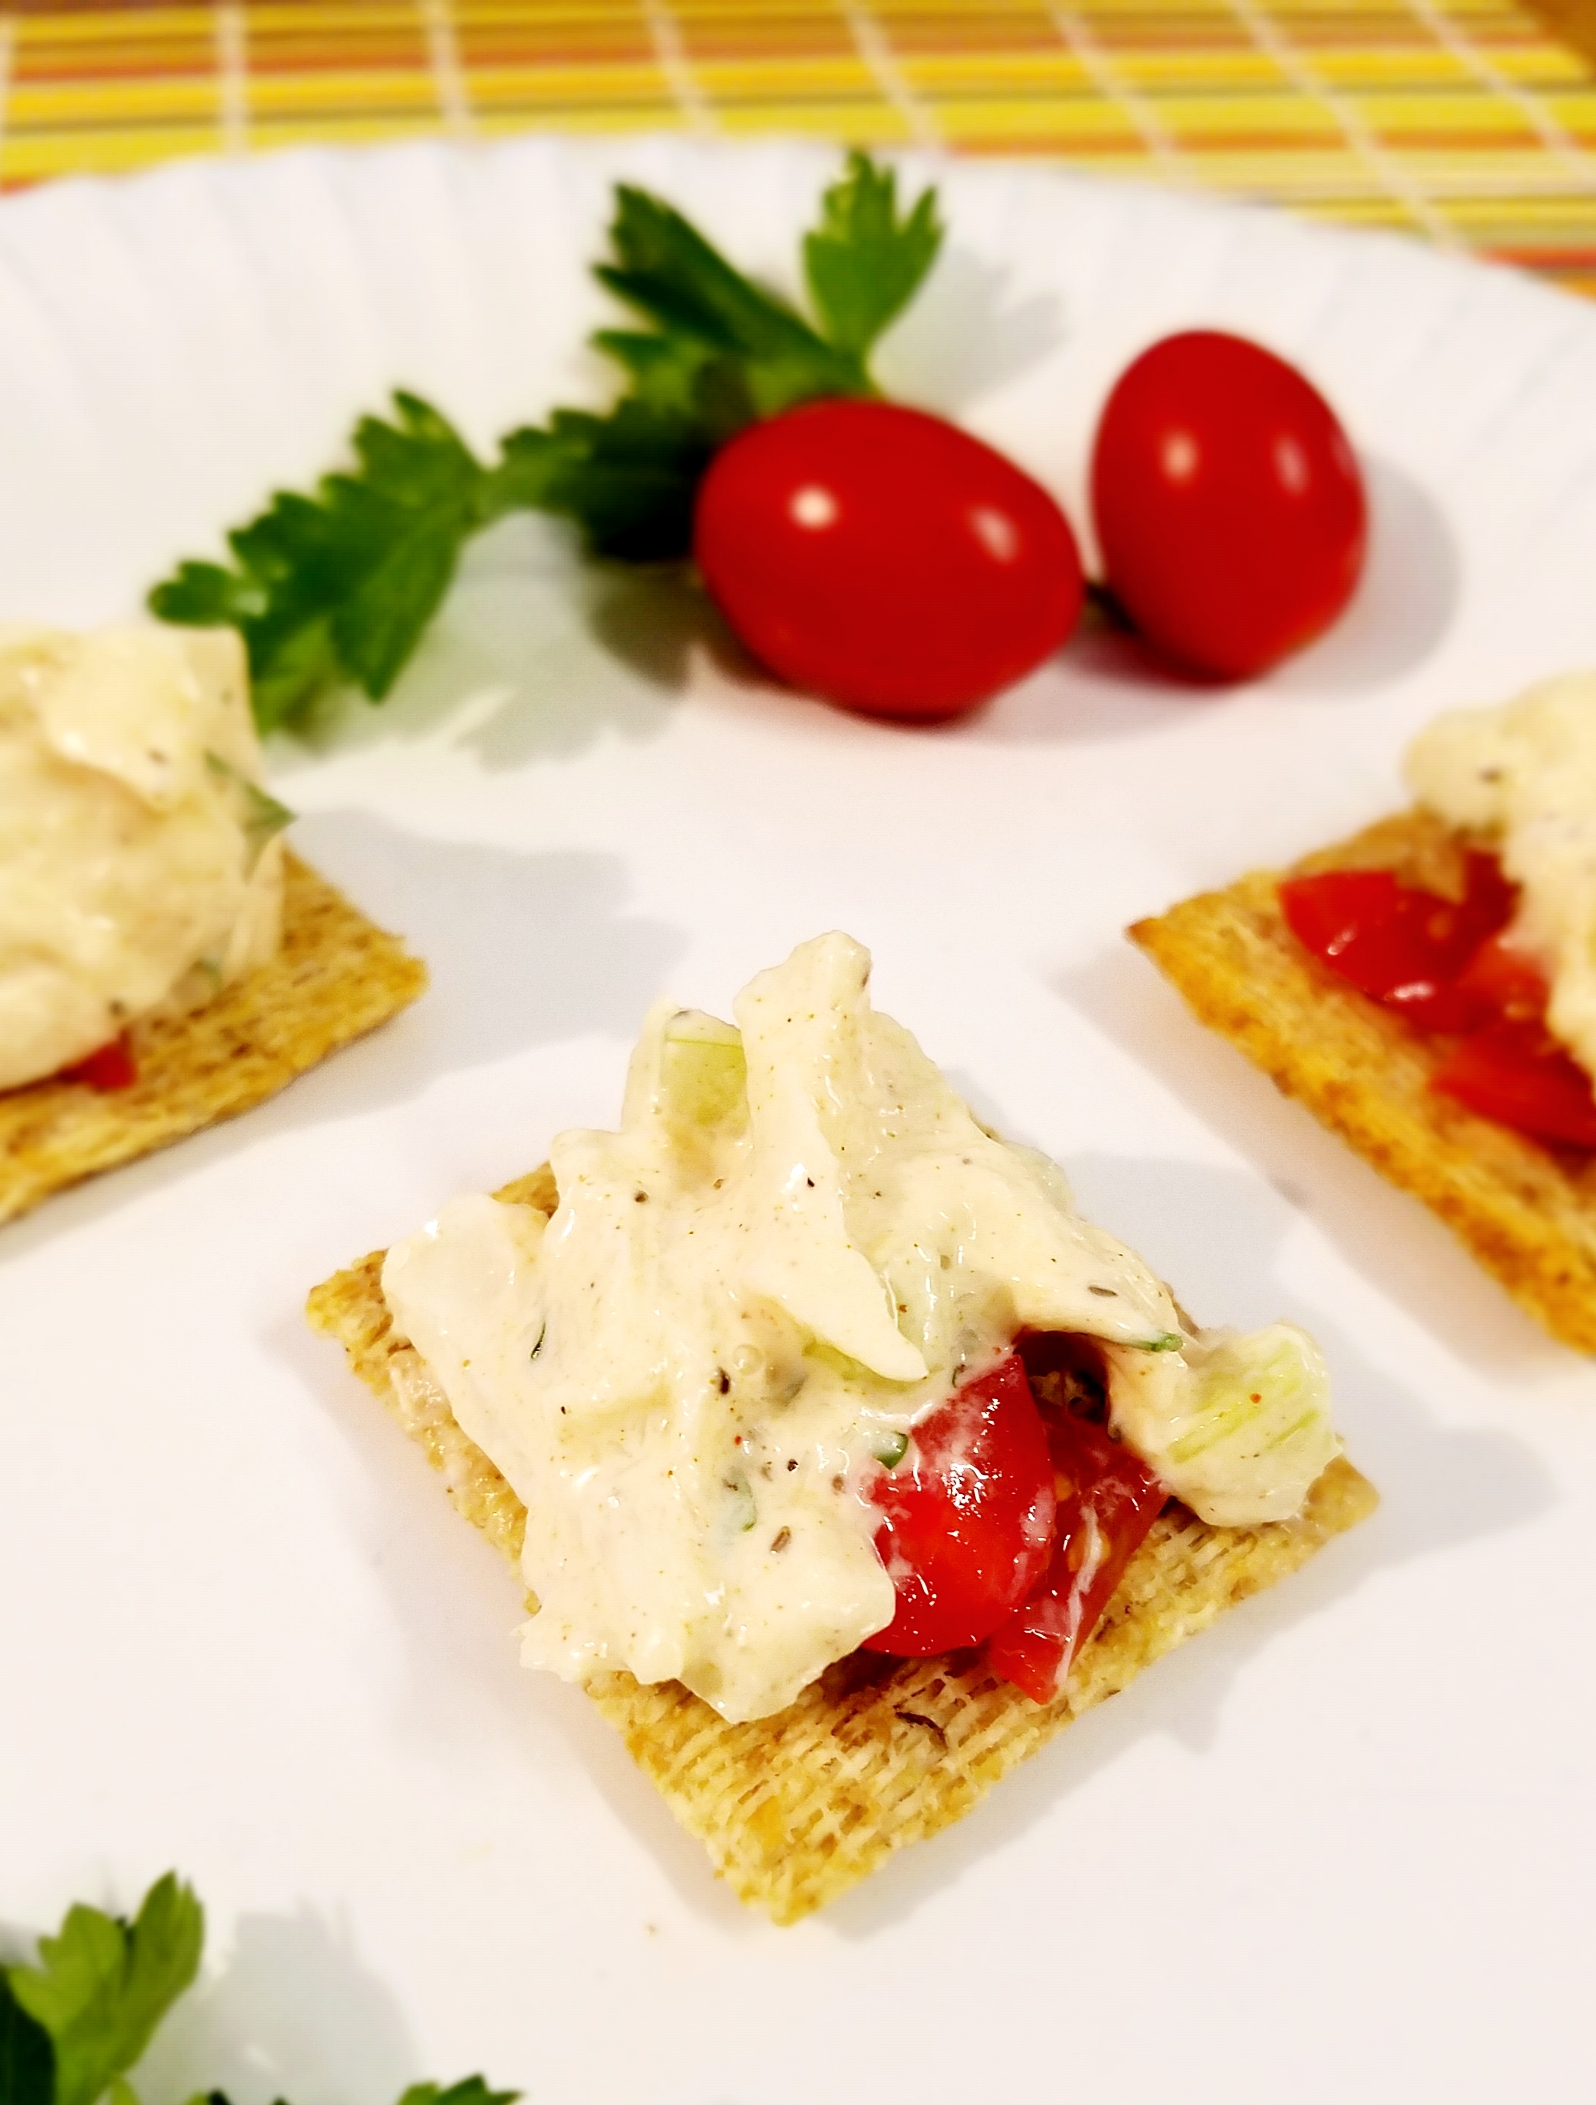 Vegan Crab Salad on crackers.